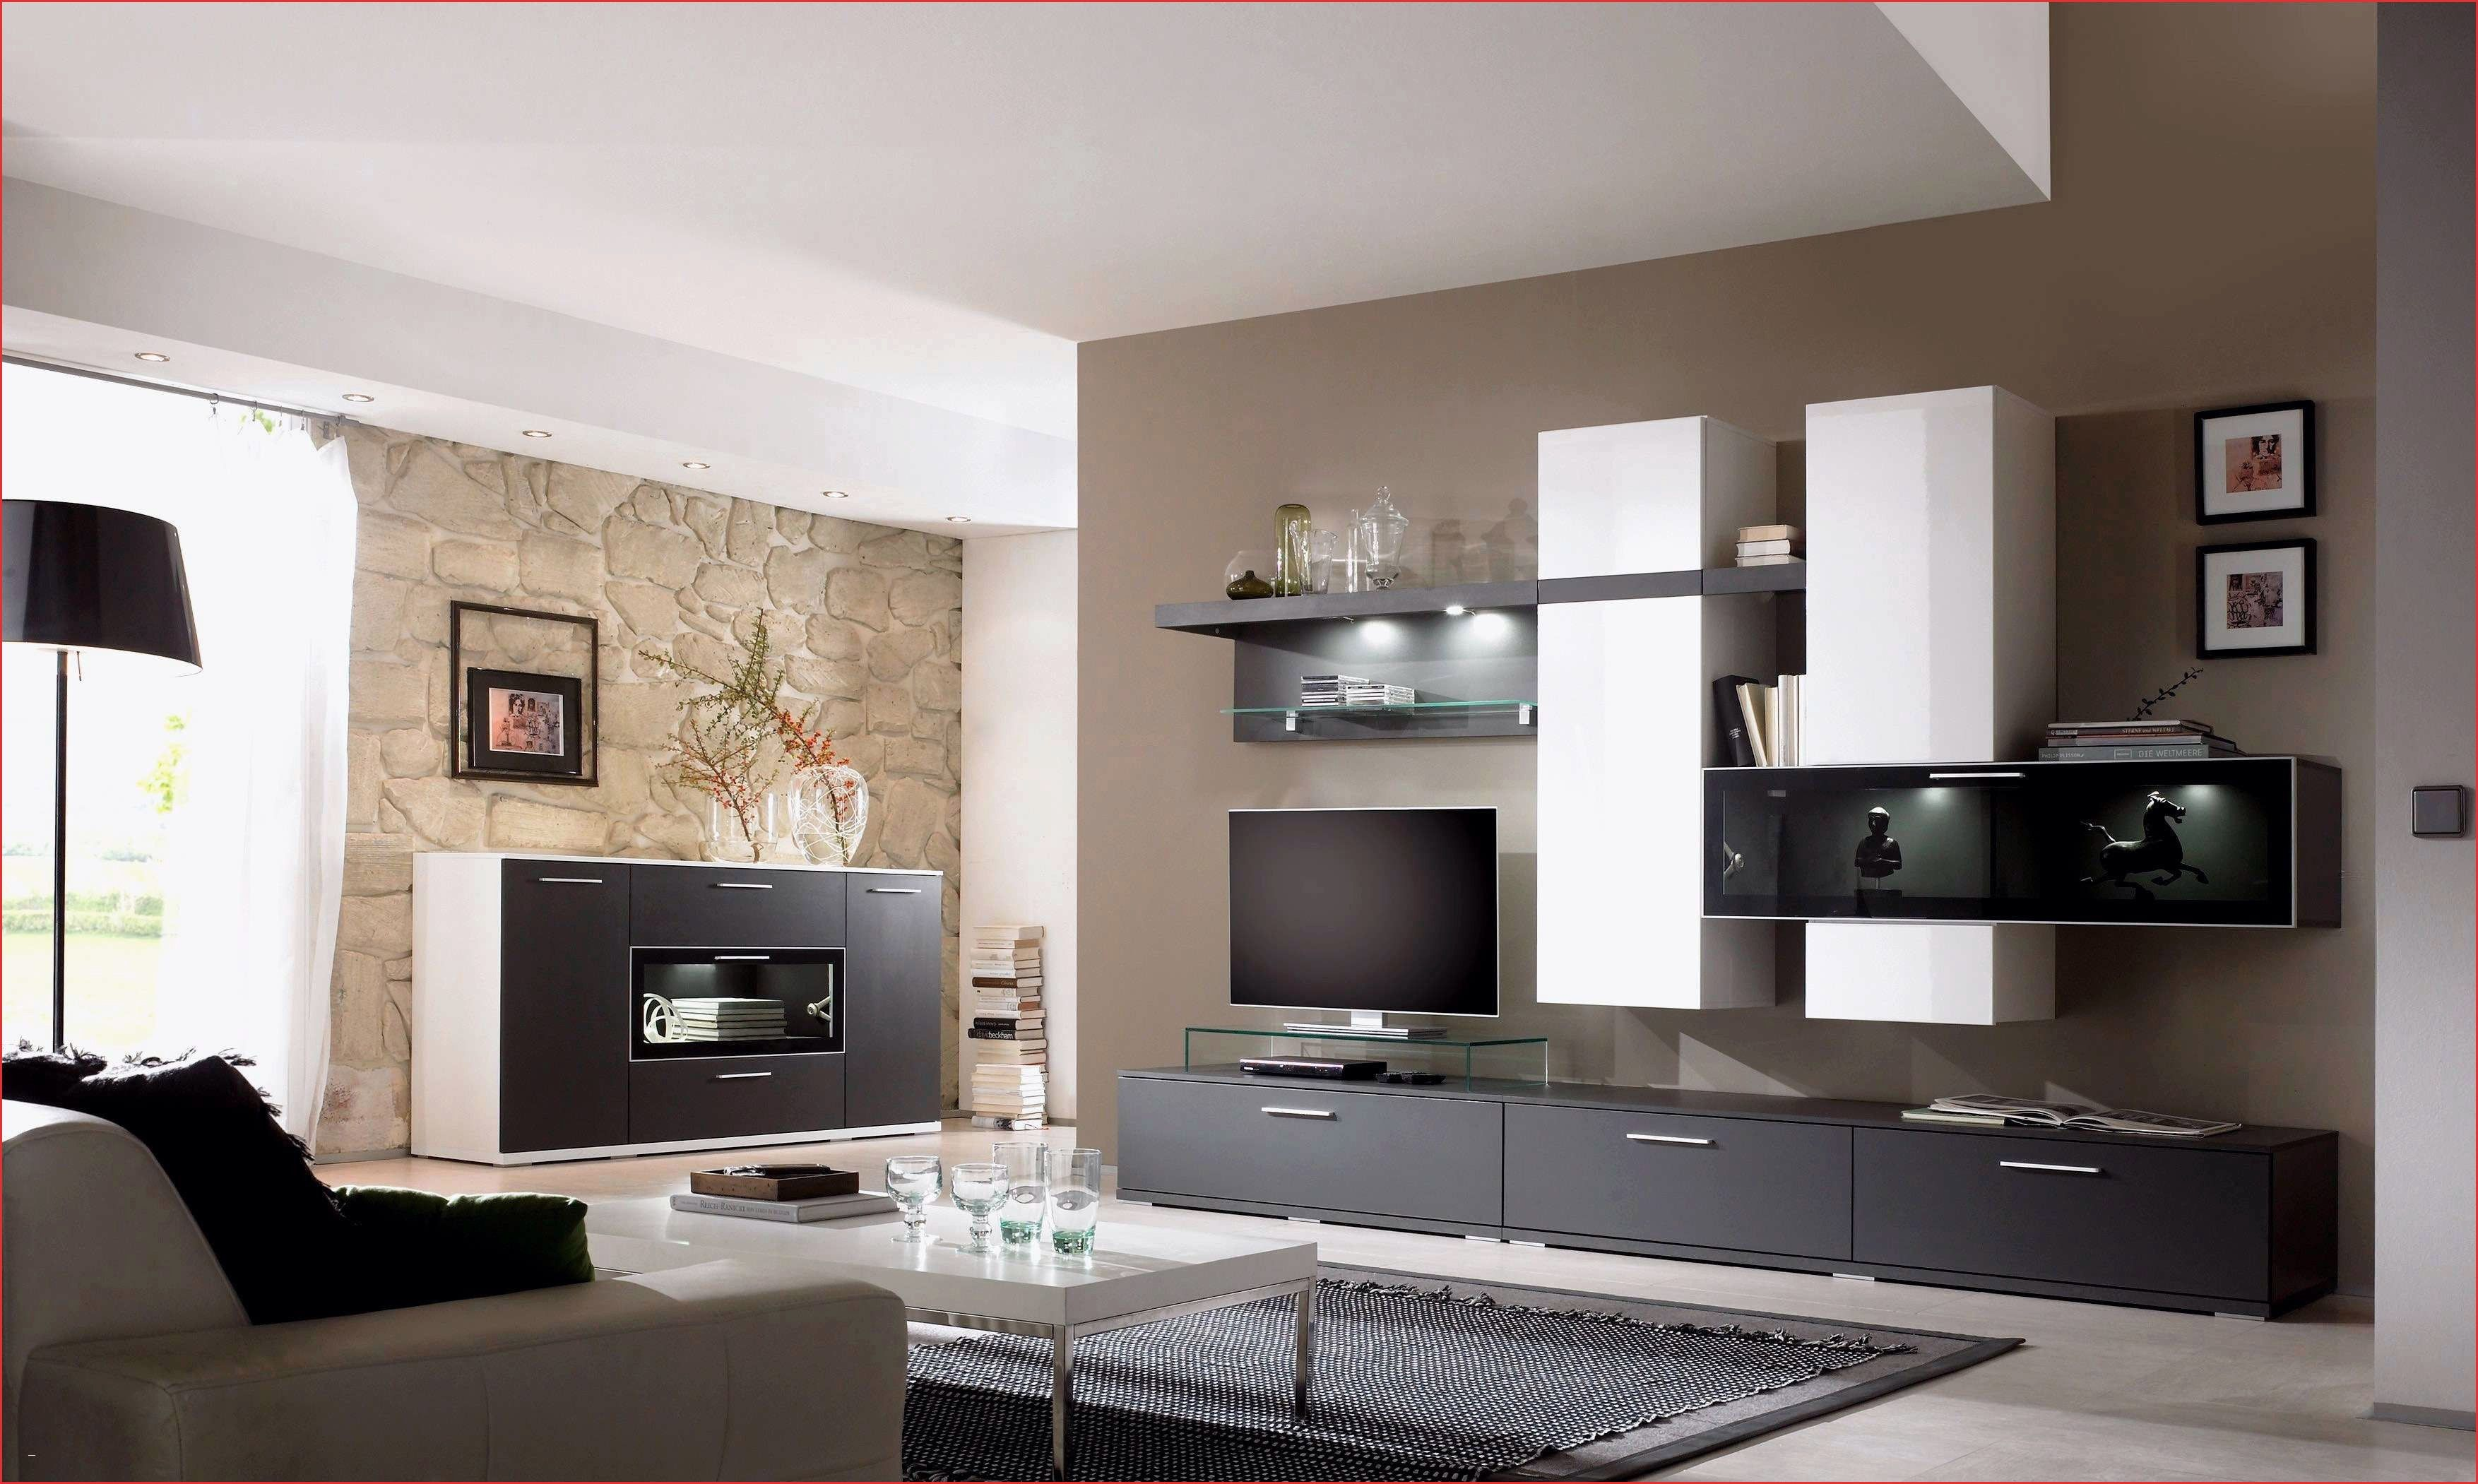 Weisses Badezimmer Dekorieren Brown Living Room Decor Modern Furniture Living Room Modern Country Living Room